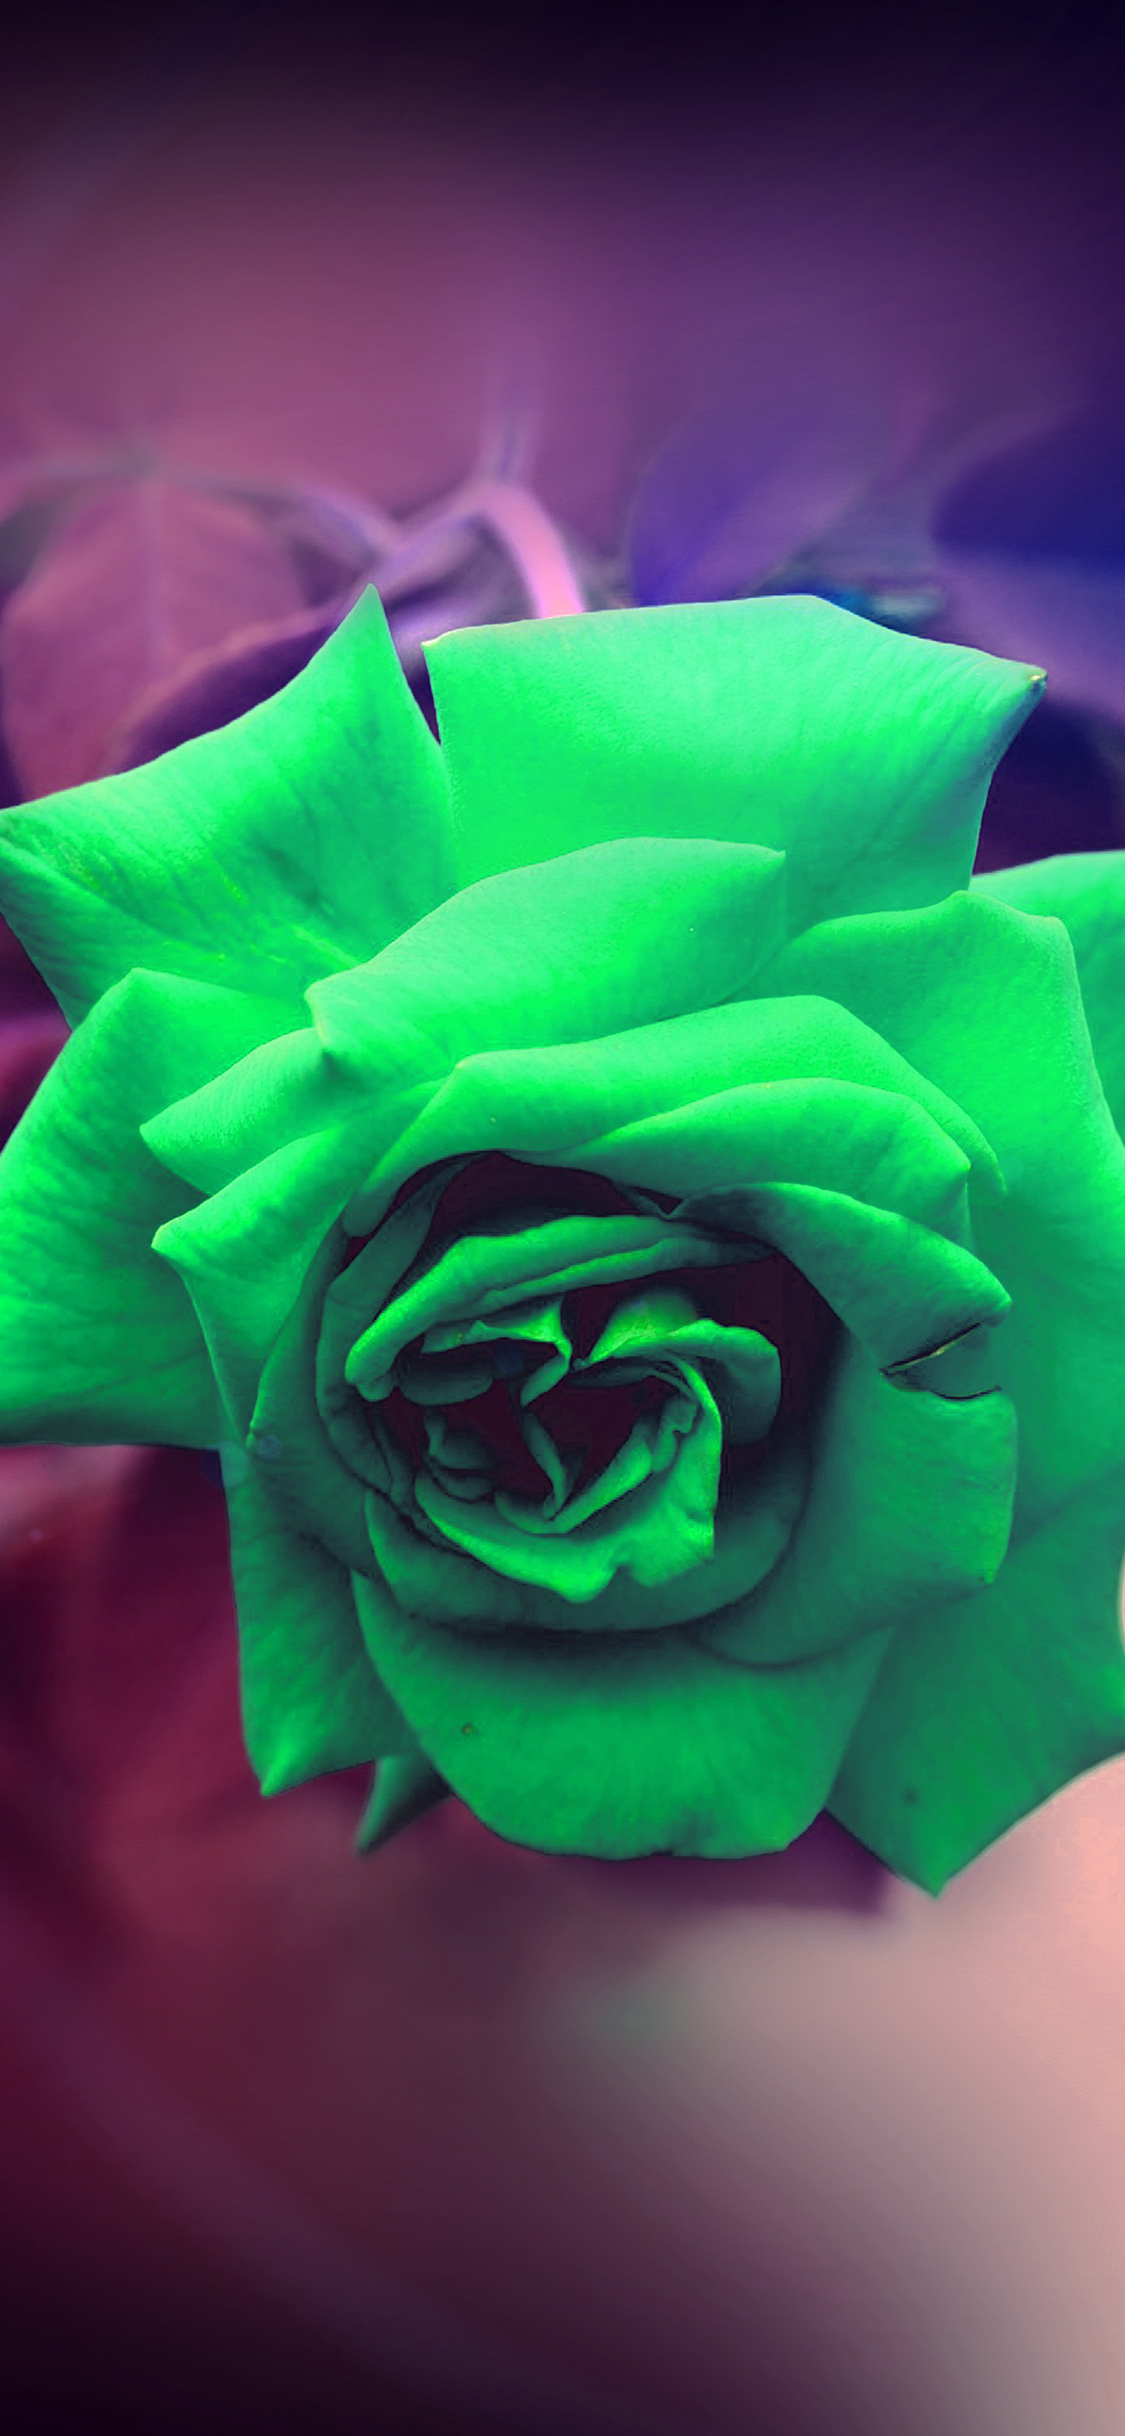 Iphonexpapers Com Iphone X Wallpaper My90 Green Rose